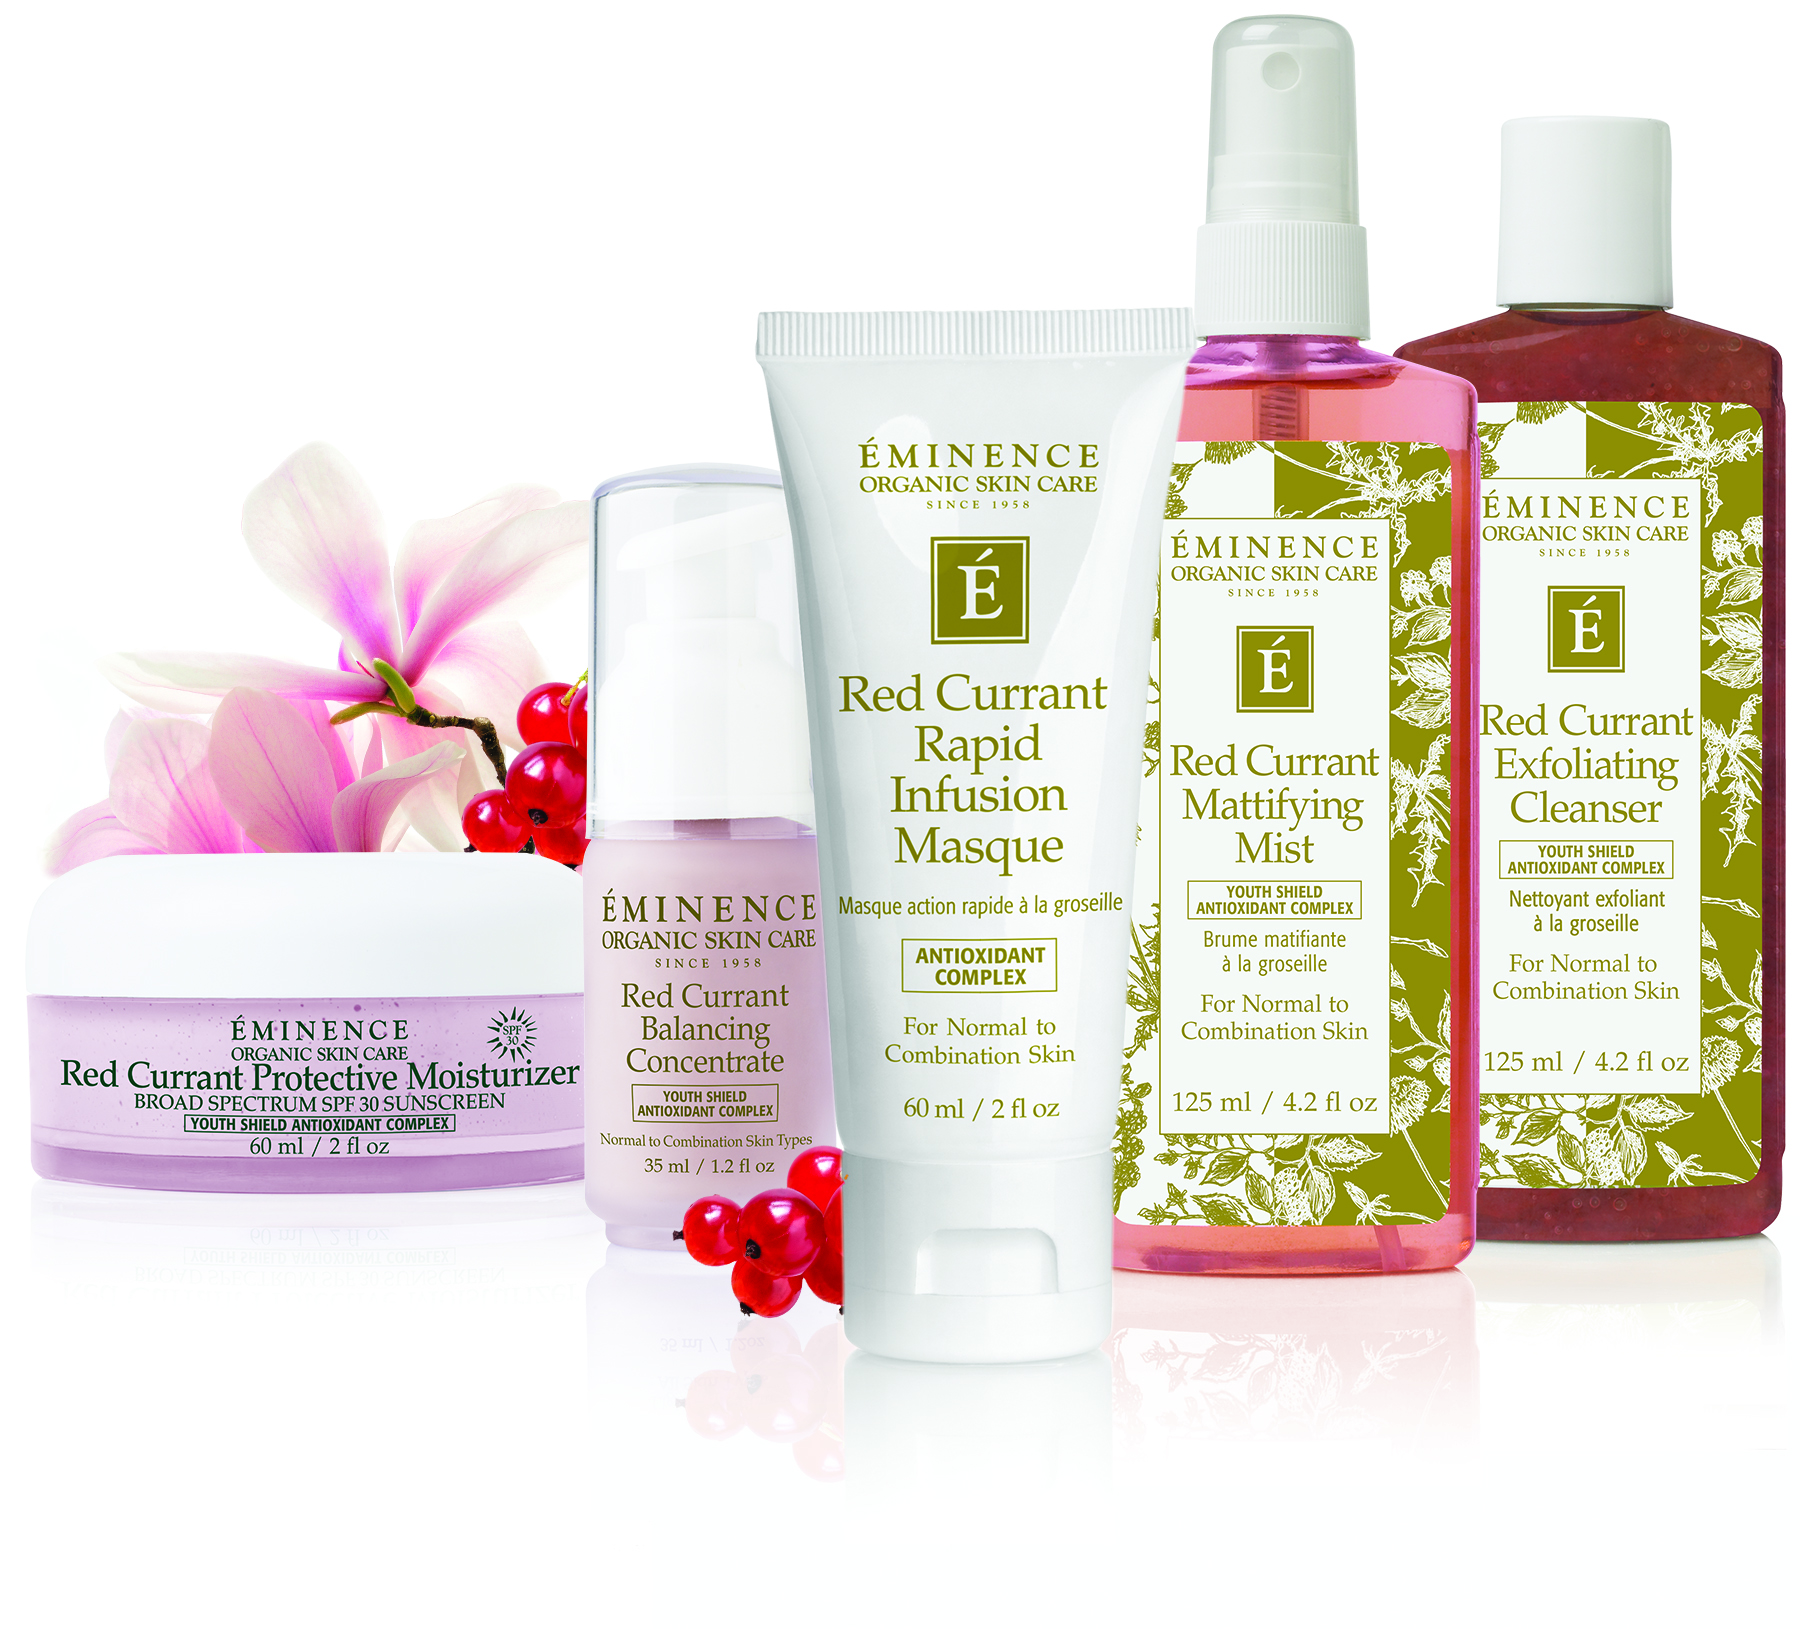 Eminence Organic Skin Care Vancouver